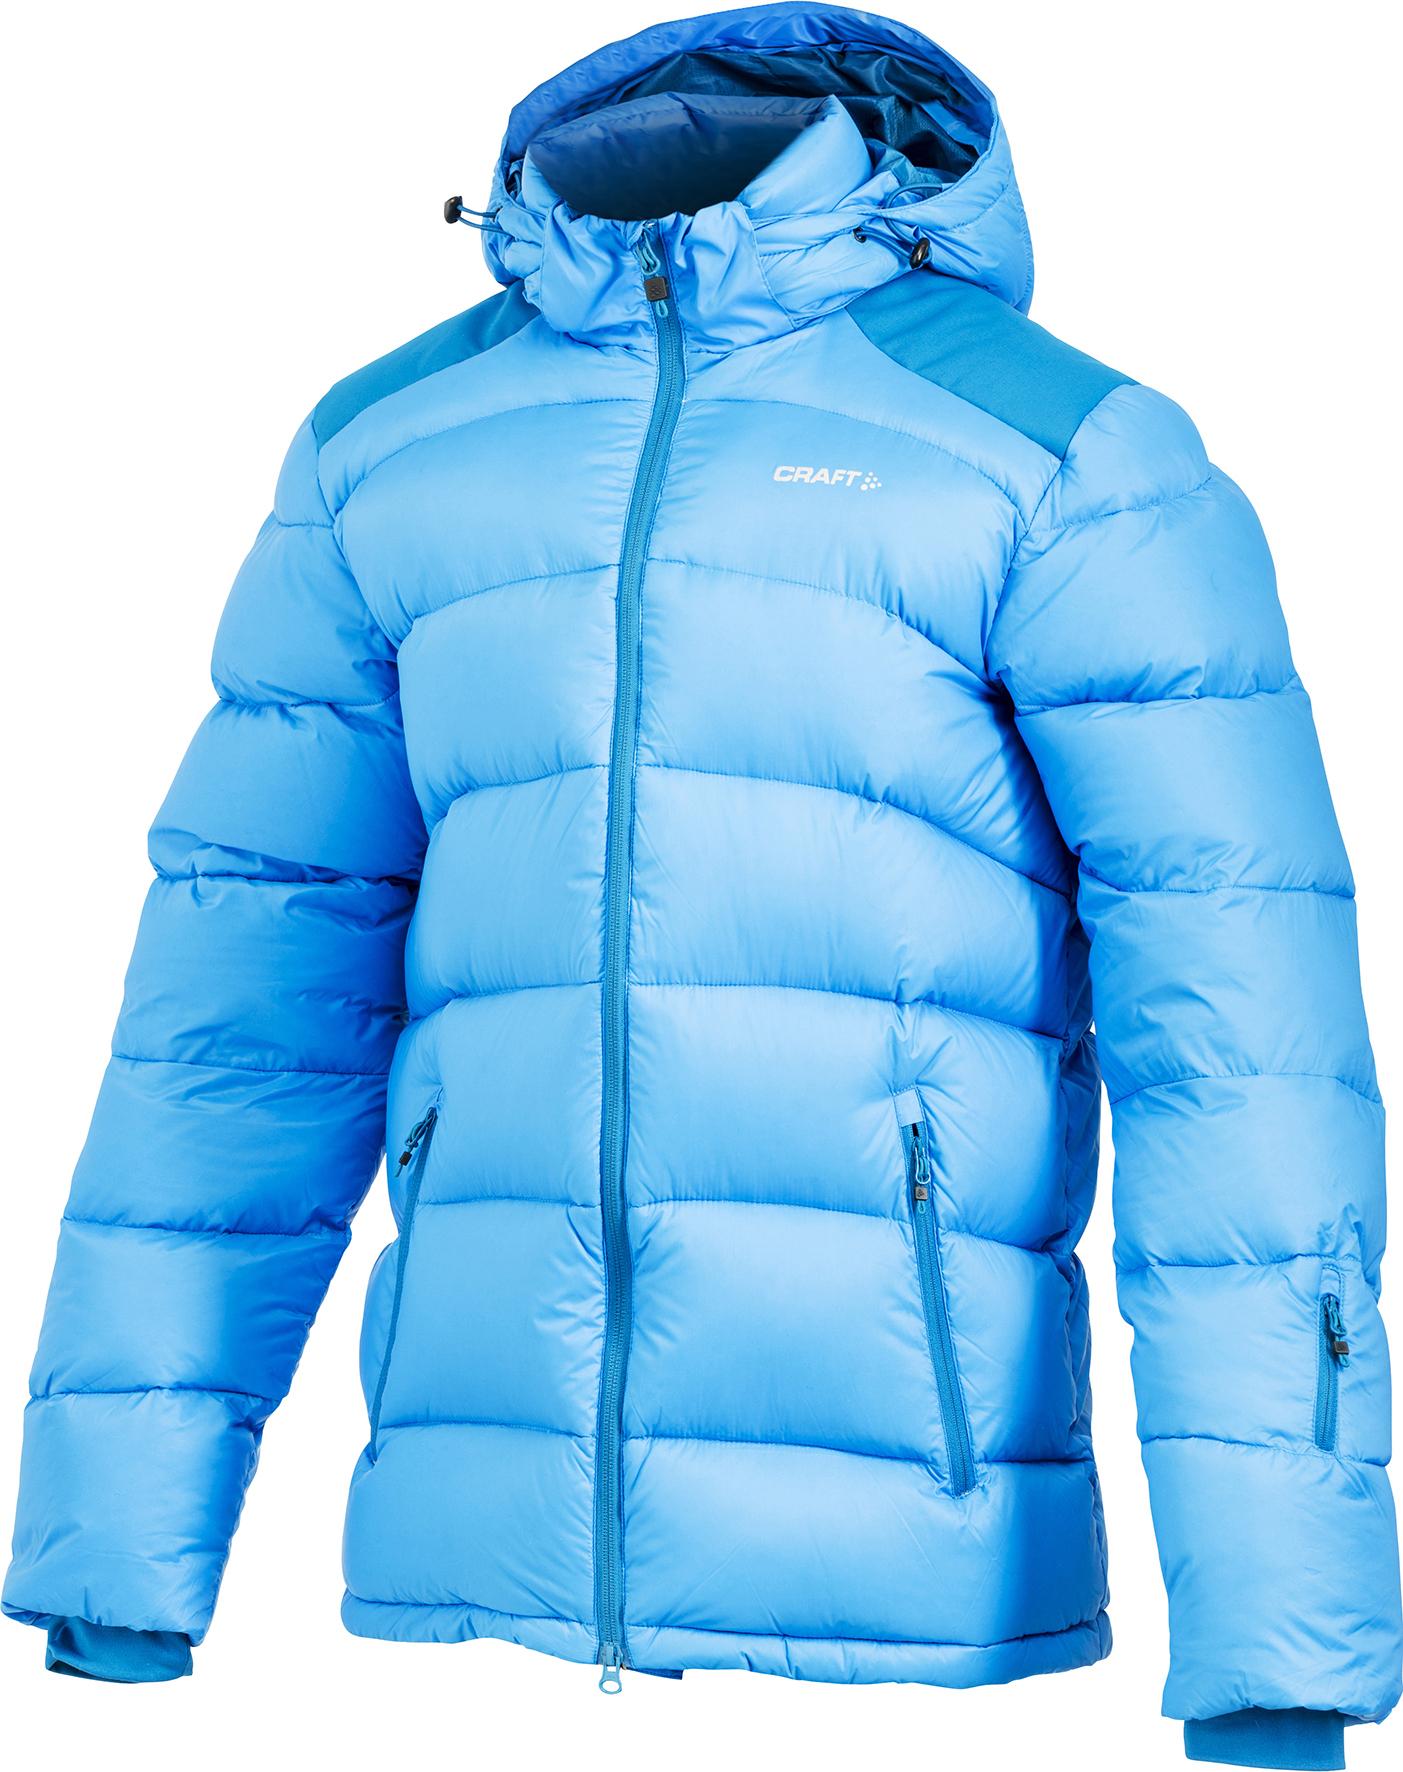 Куртка-пуховик Craft Down мужская